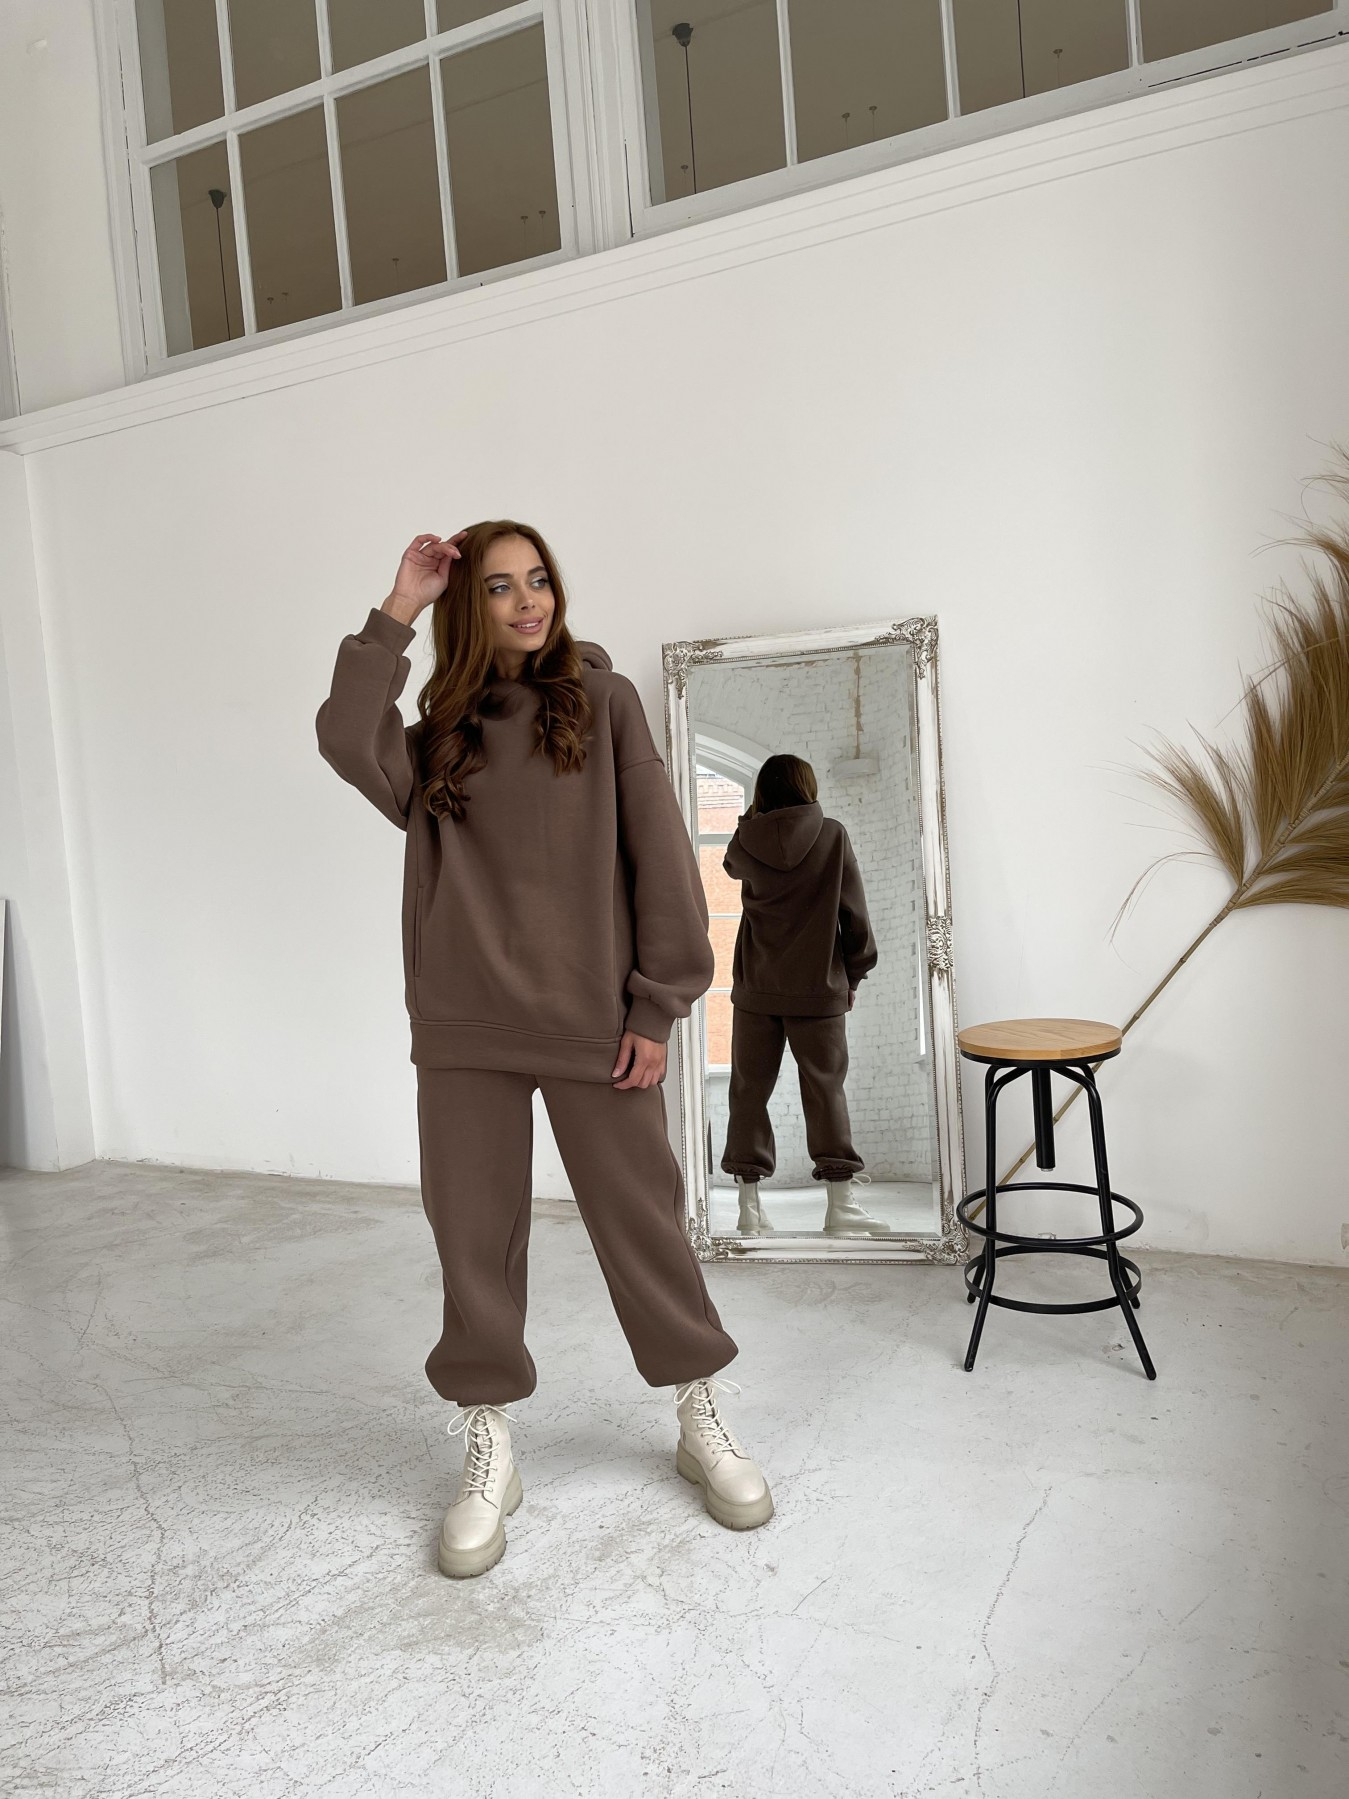 Марион утепленный костюм из трехнити 11852 АРТ. 48656 Цвет: Шоколад - фото 5, интернет магазин tm-modus.ru